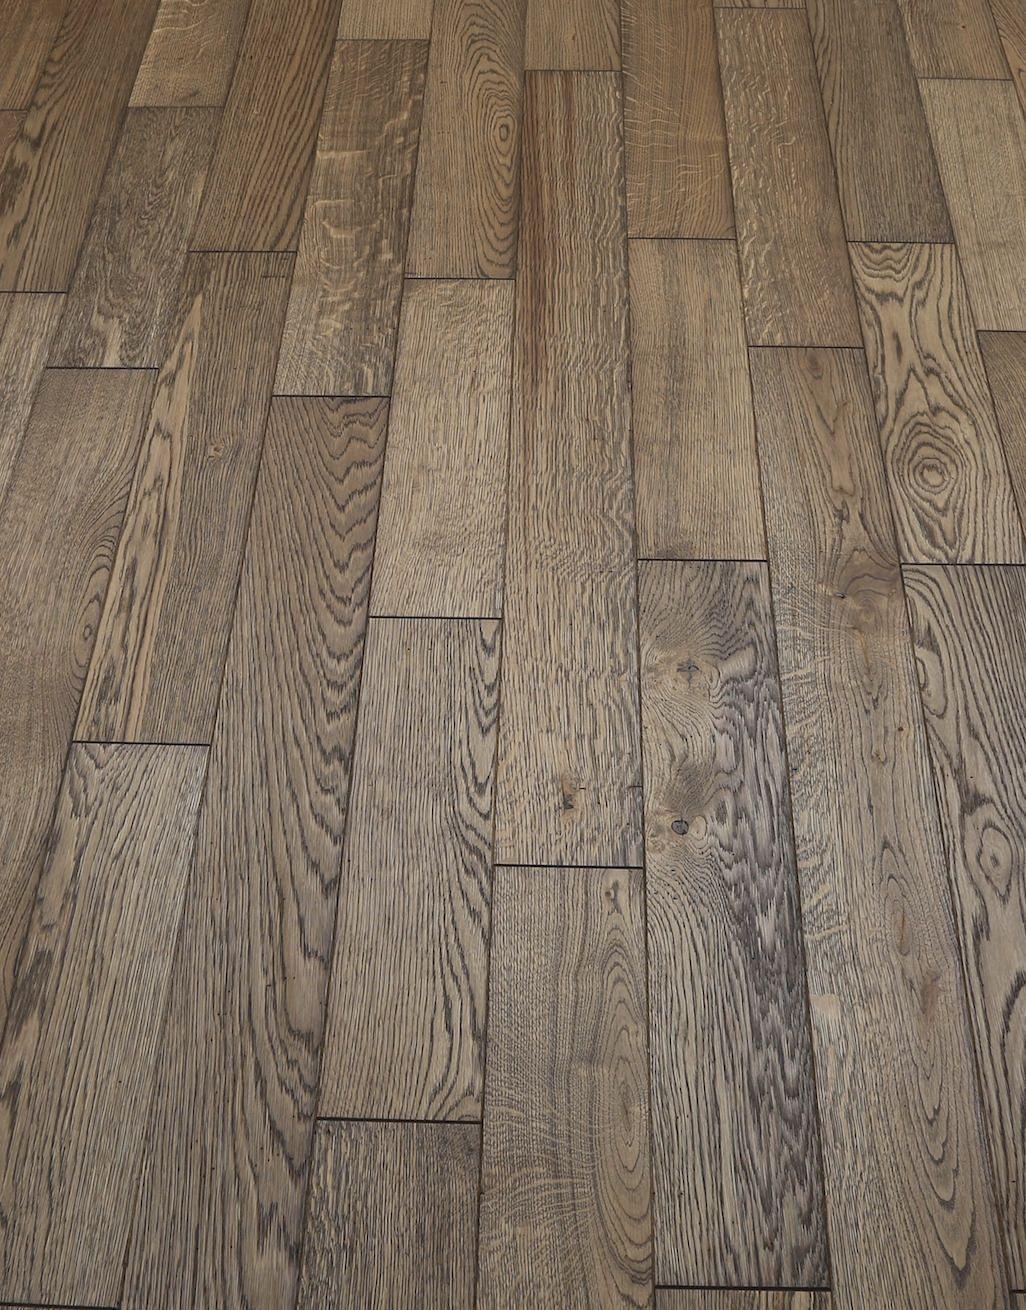 Aged Rustic Brown Oak Brushed Oiled Solid Wood Flooring Orangeandblackinteriors Woodflooring Carpet Laminate With Images Rustic Laminate Flooring Rustic Wood Floors